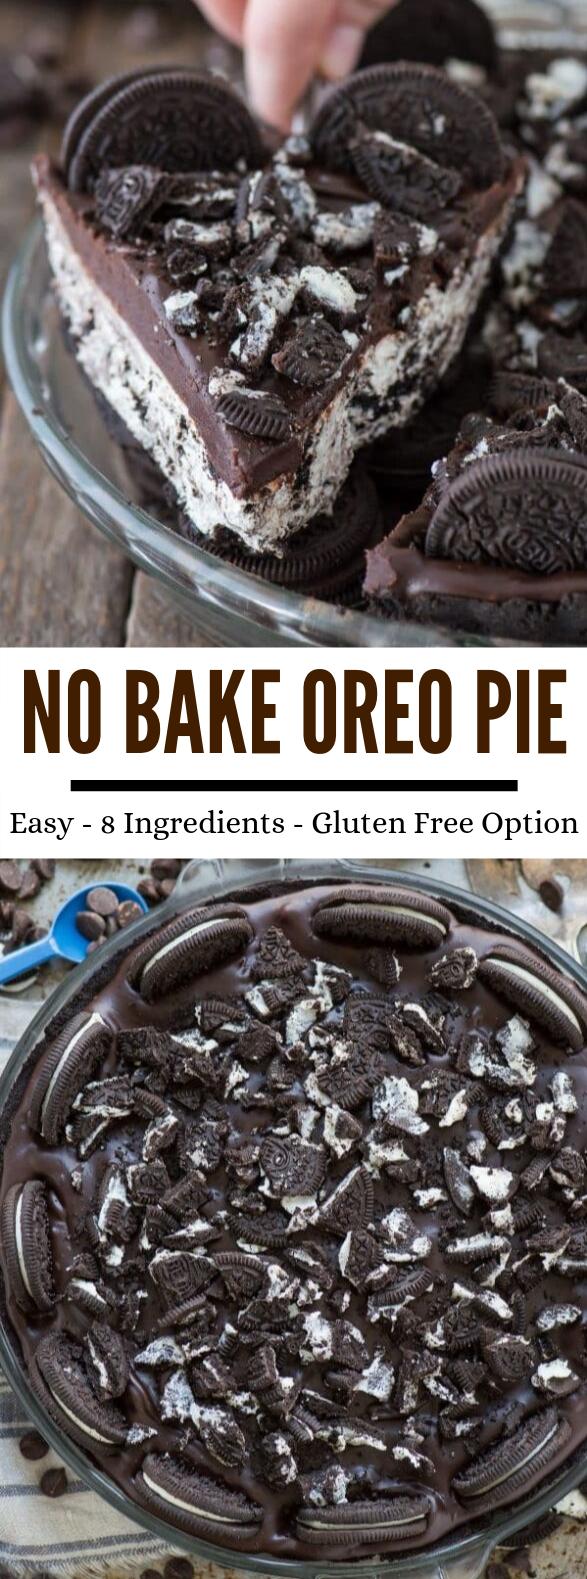 No Bake Oreo Pie #desserts #cake